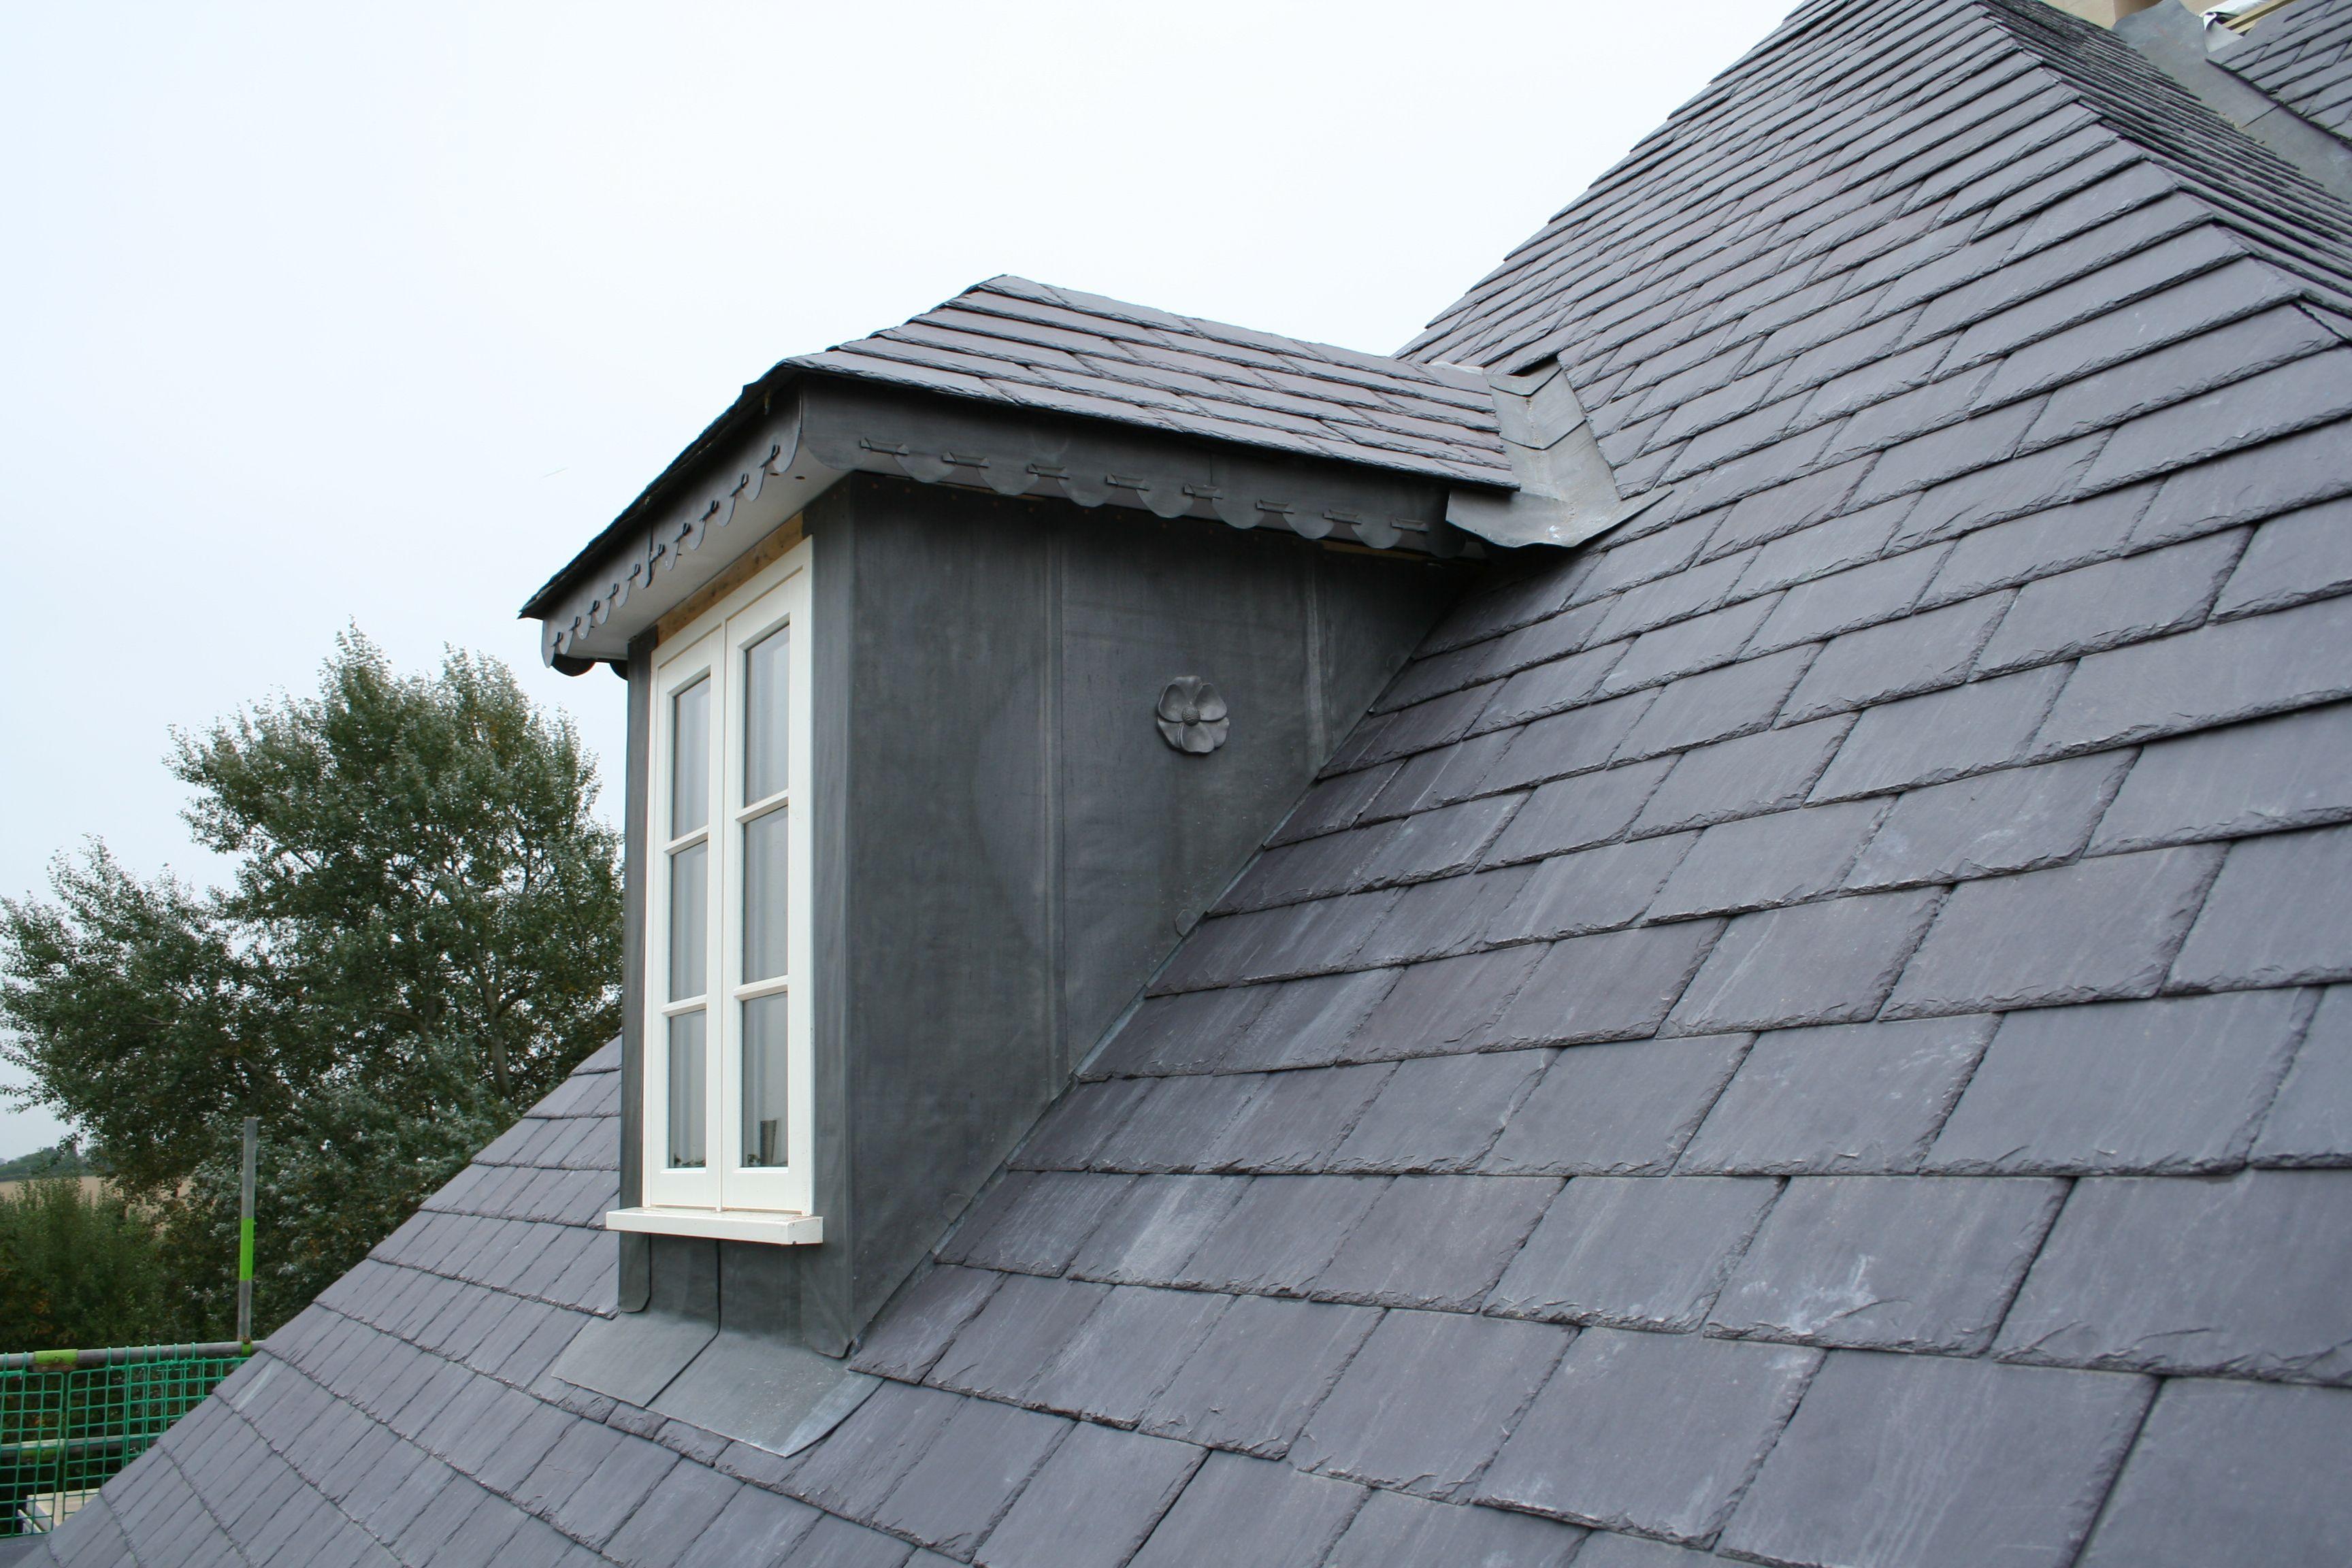 Dormer Window With Lead Cheeks And Slate Roof Dormer